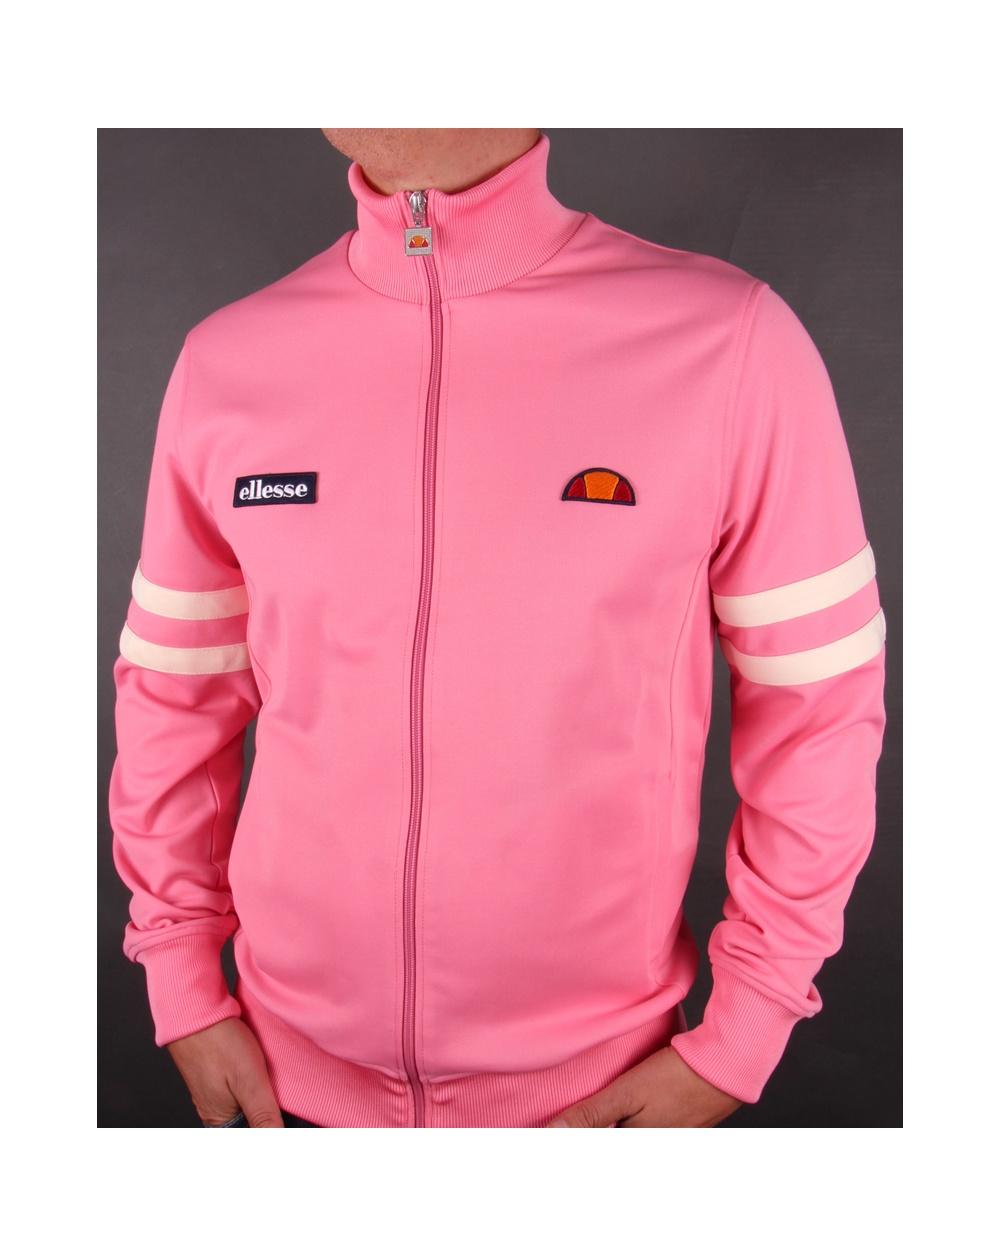 Ellesse Roma 2 Track Top Pink Tracksuit Jacket Exclusive Mens